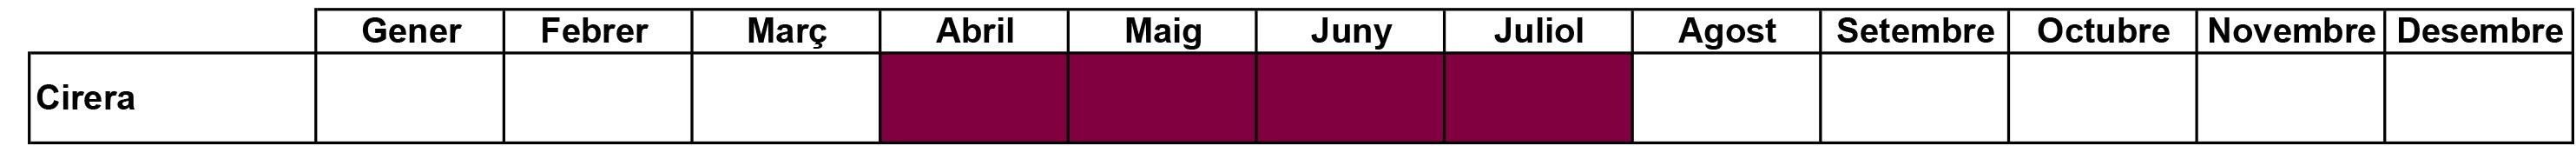 01-Calendari Cirera